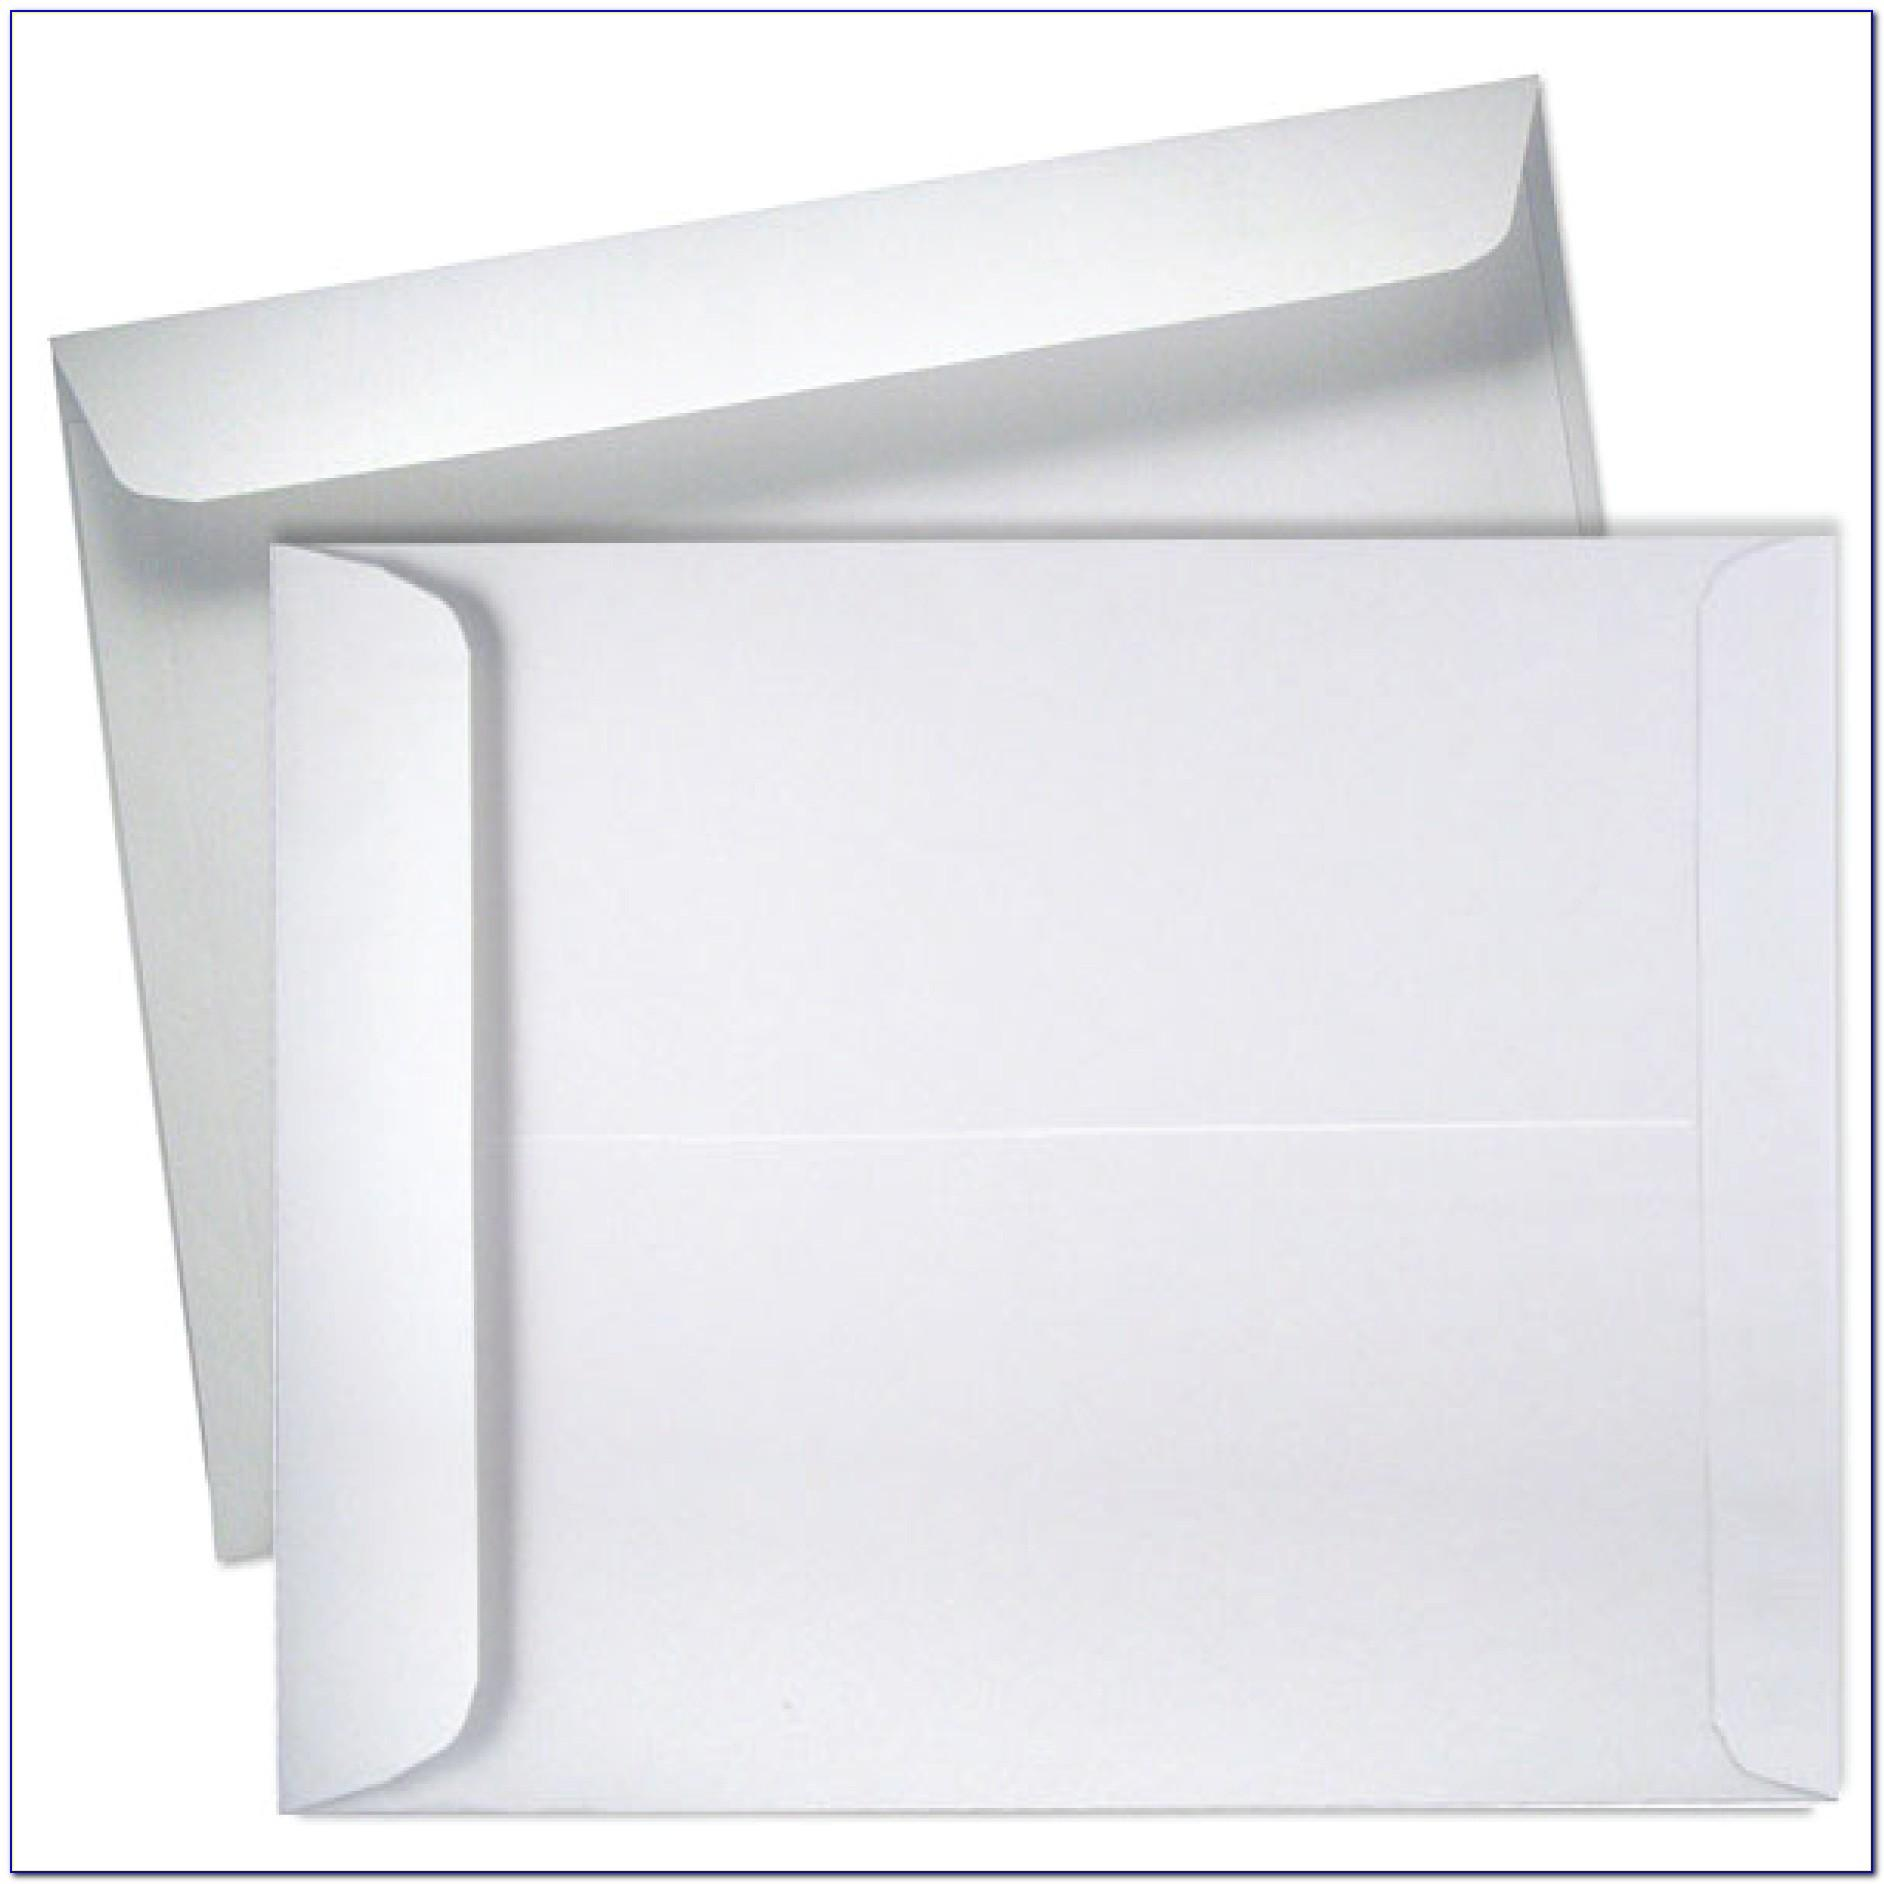 10x13 Catalog Envelope Template